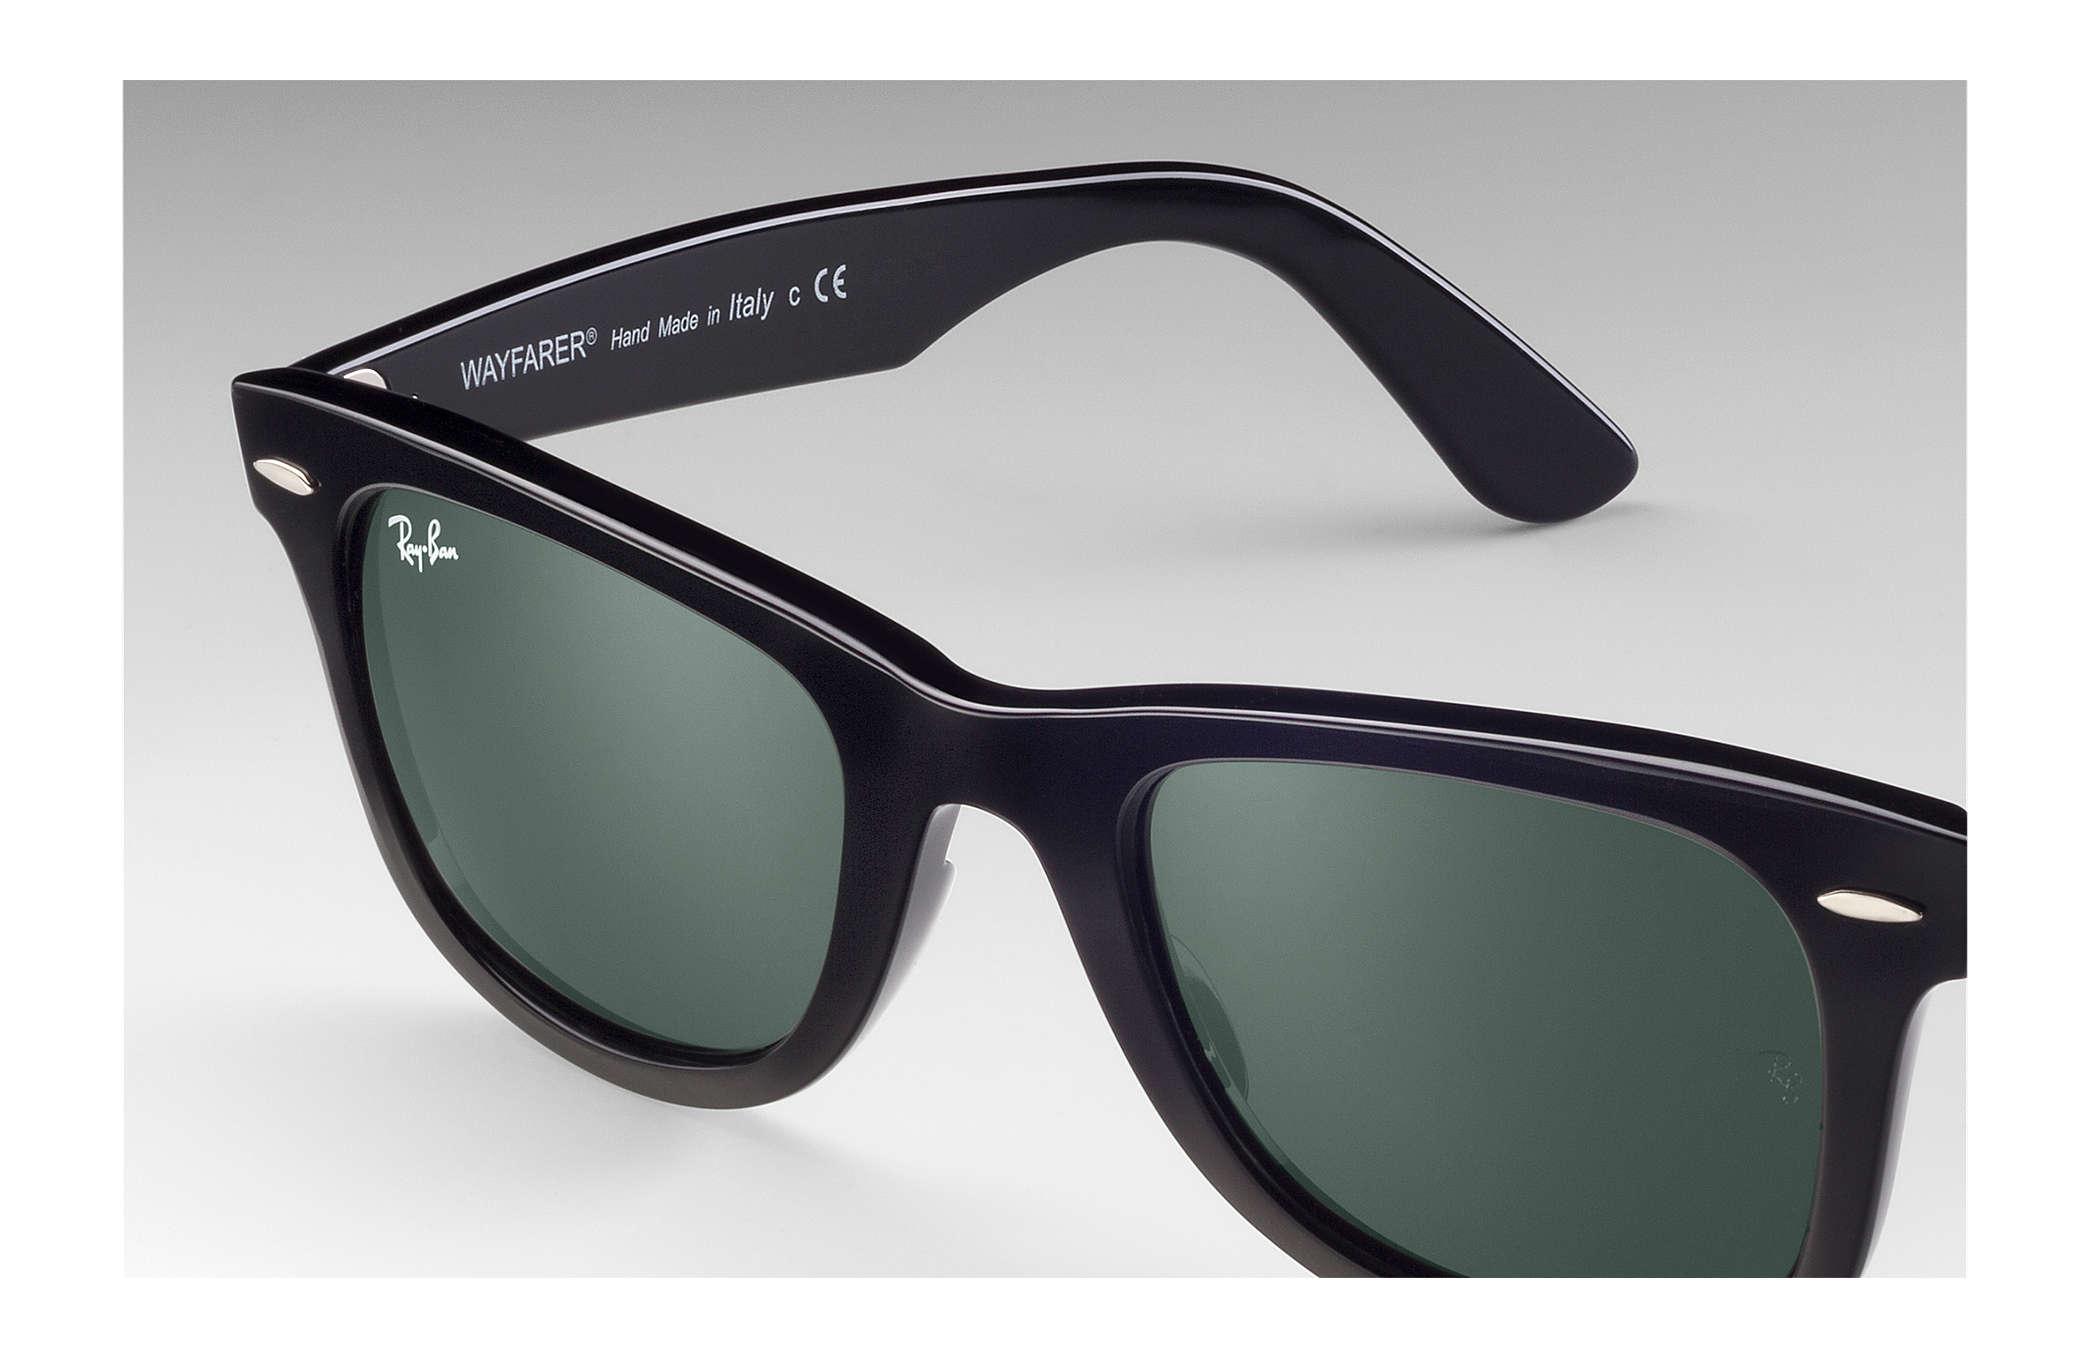 e15b49725 Ray-Ban Wayfarer Ease RB4340 Black - Injected - Green Lenses ...